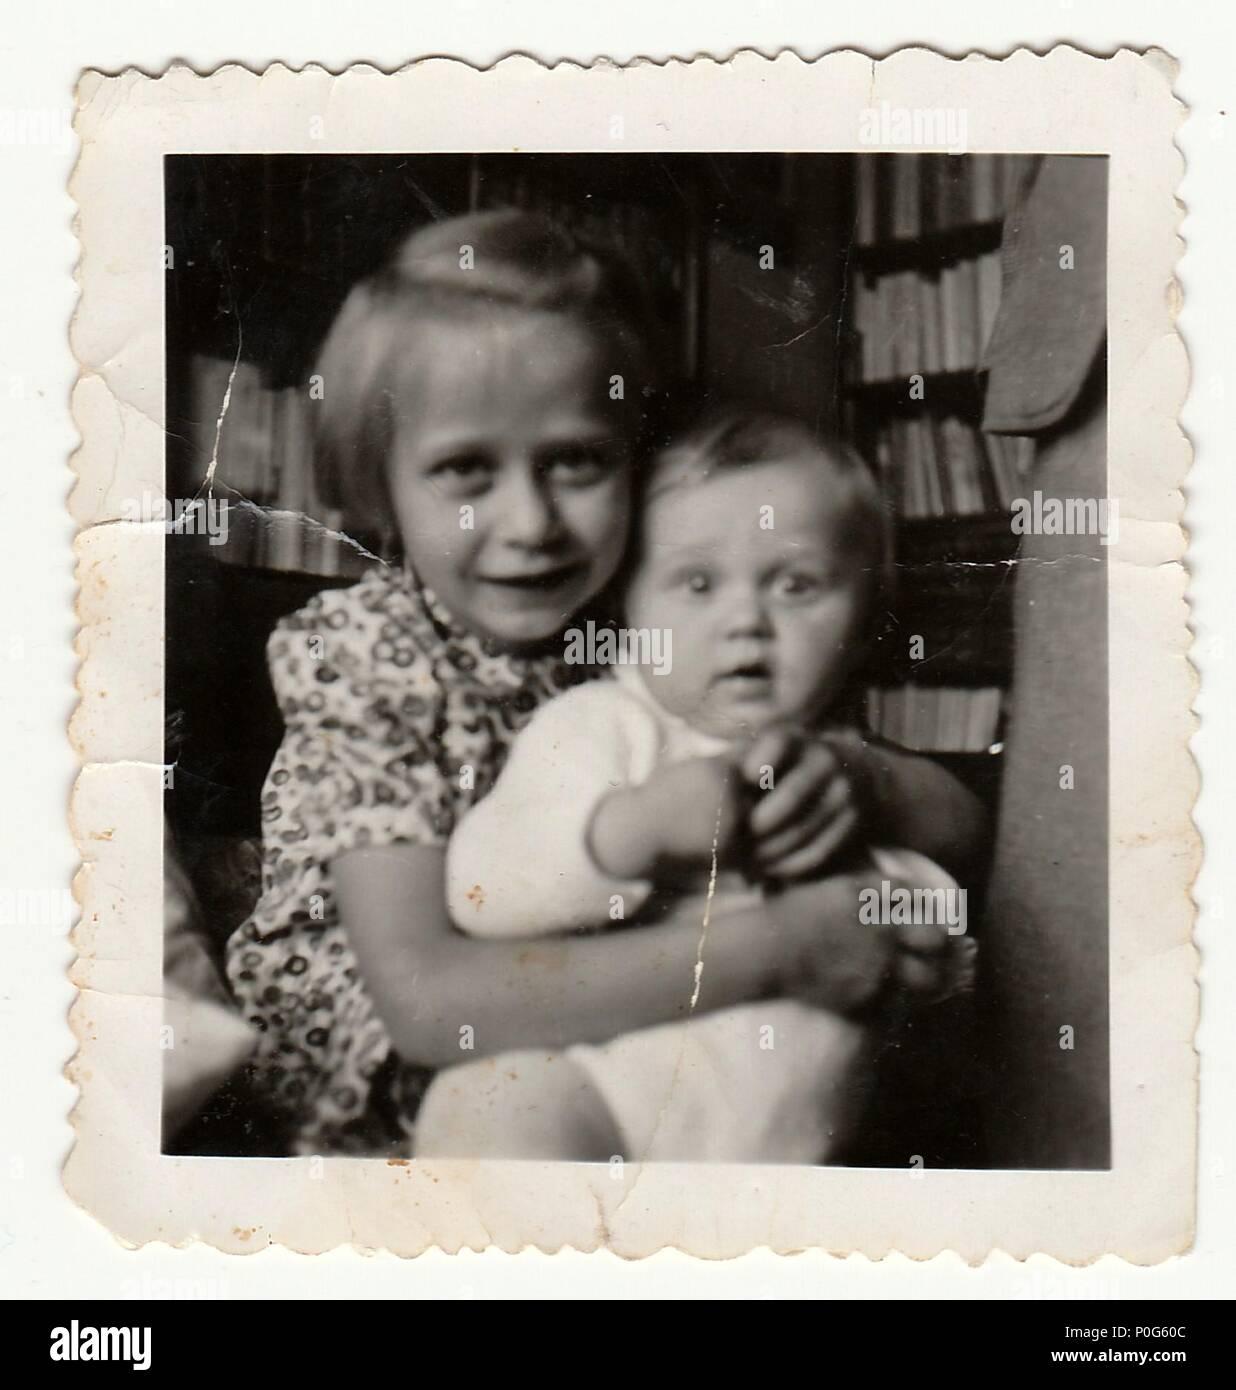 HODONIN, THE CZECHOSLOVAK REPUBLIC, CIRCA 1935: The small girls - vintage photo, circa 1935. Stock Photo